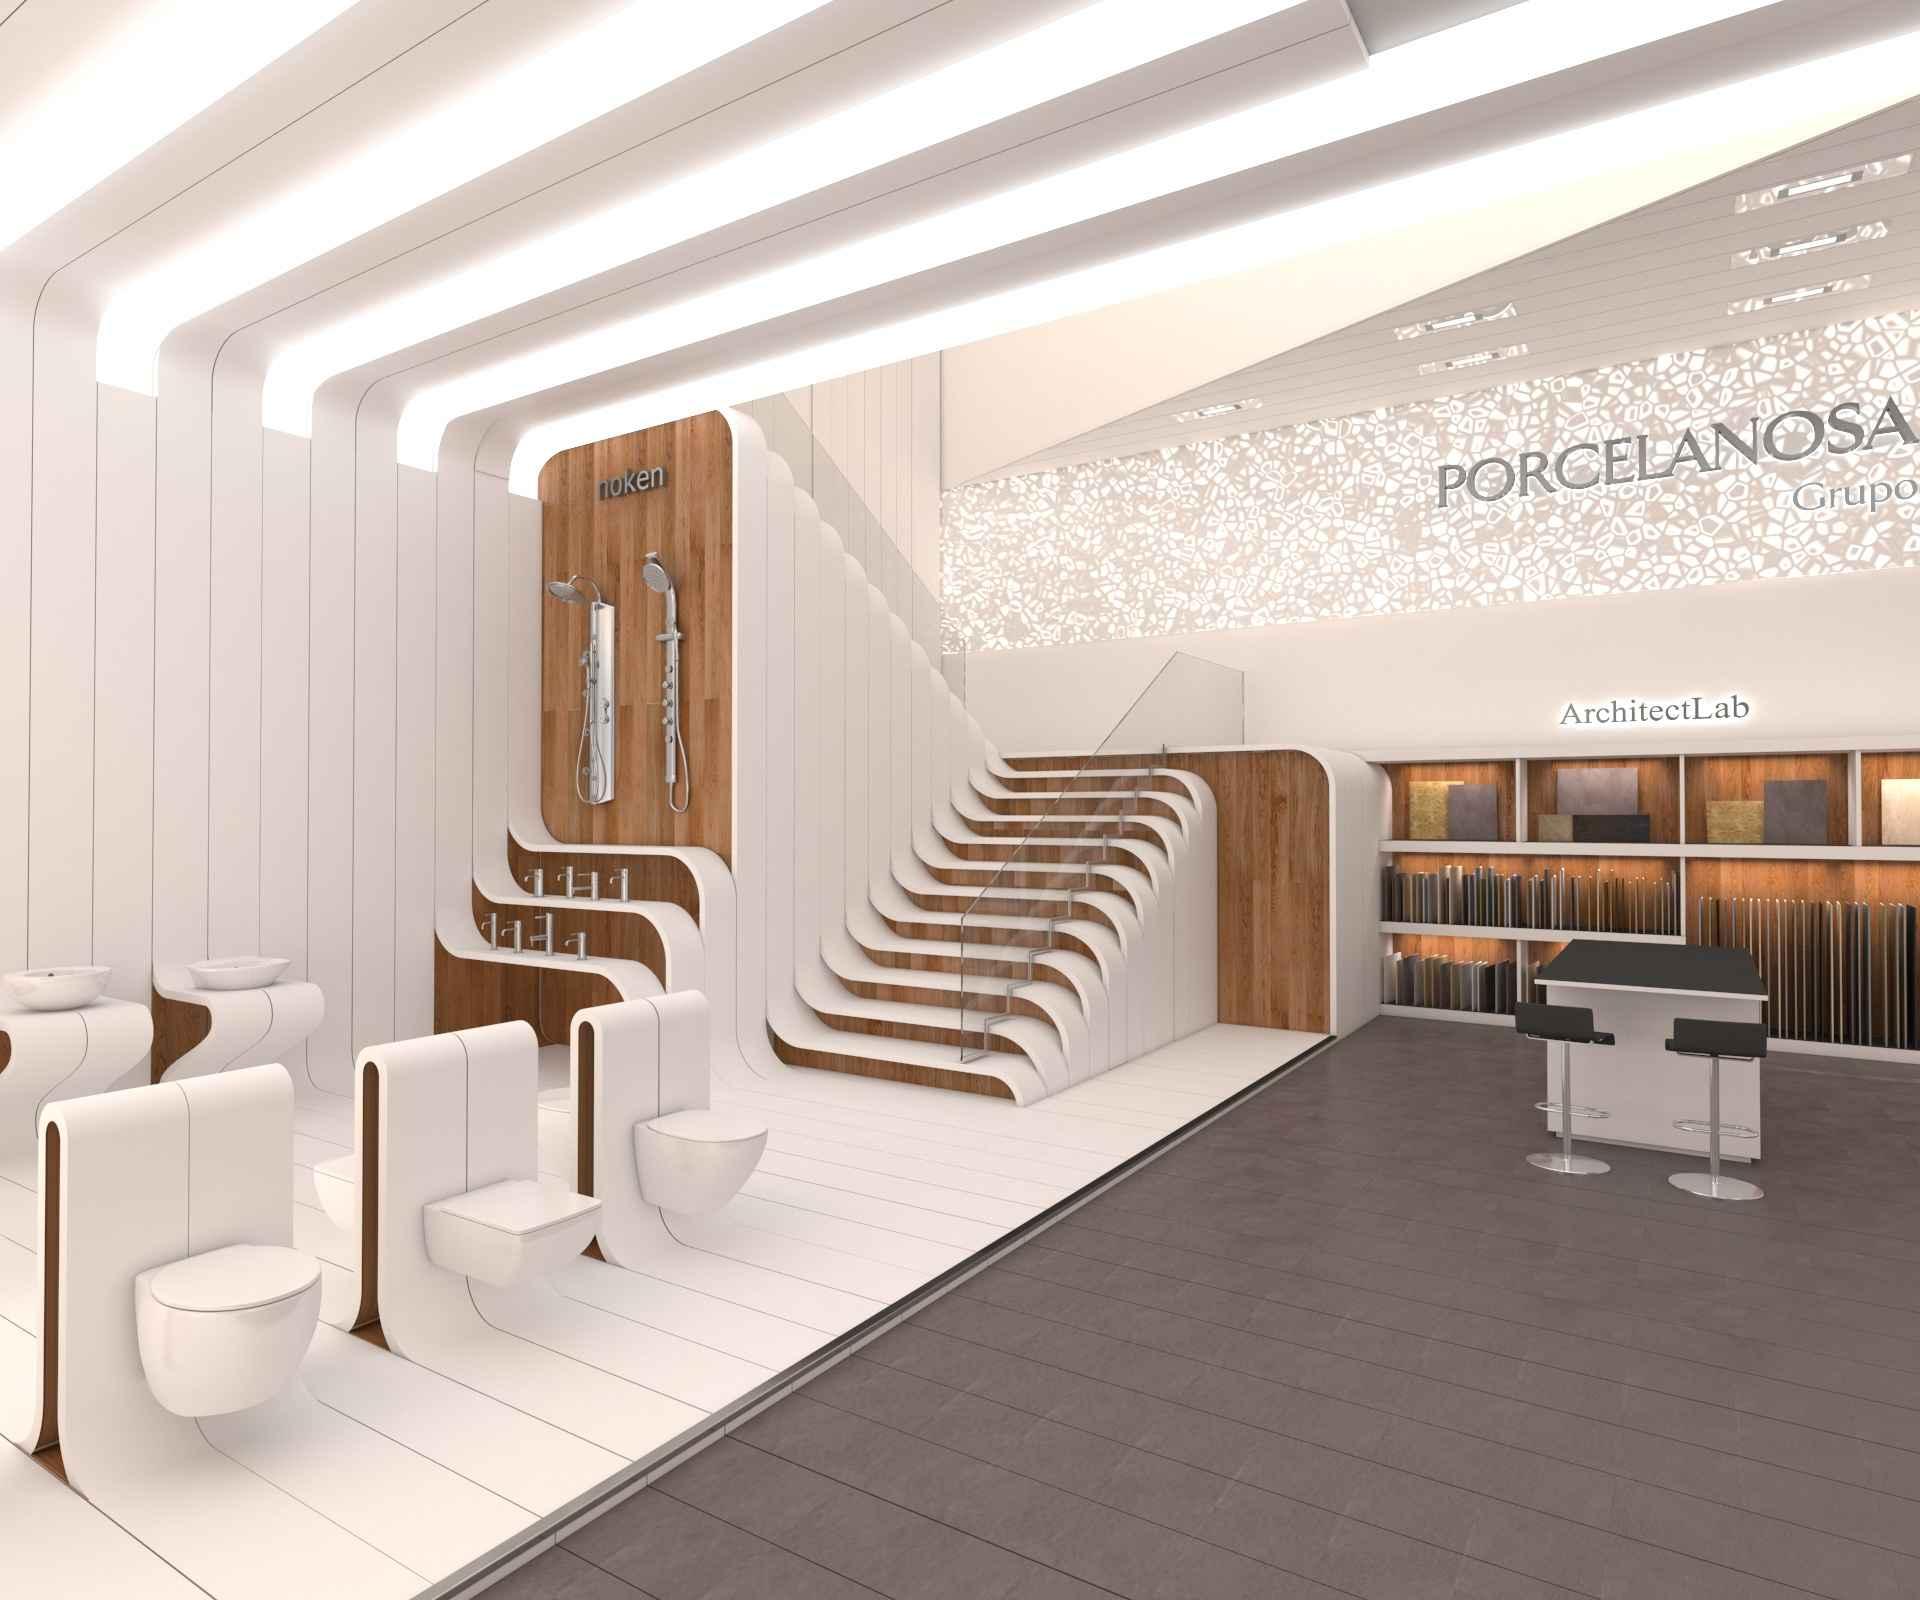 Porcelanosa convoca a X edición de los Premios de Arquitectura e Interiorismo